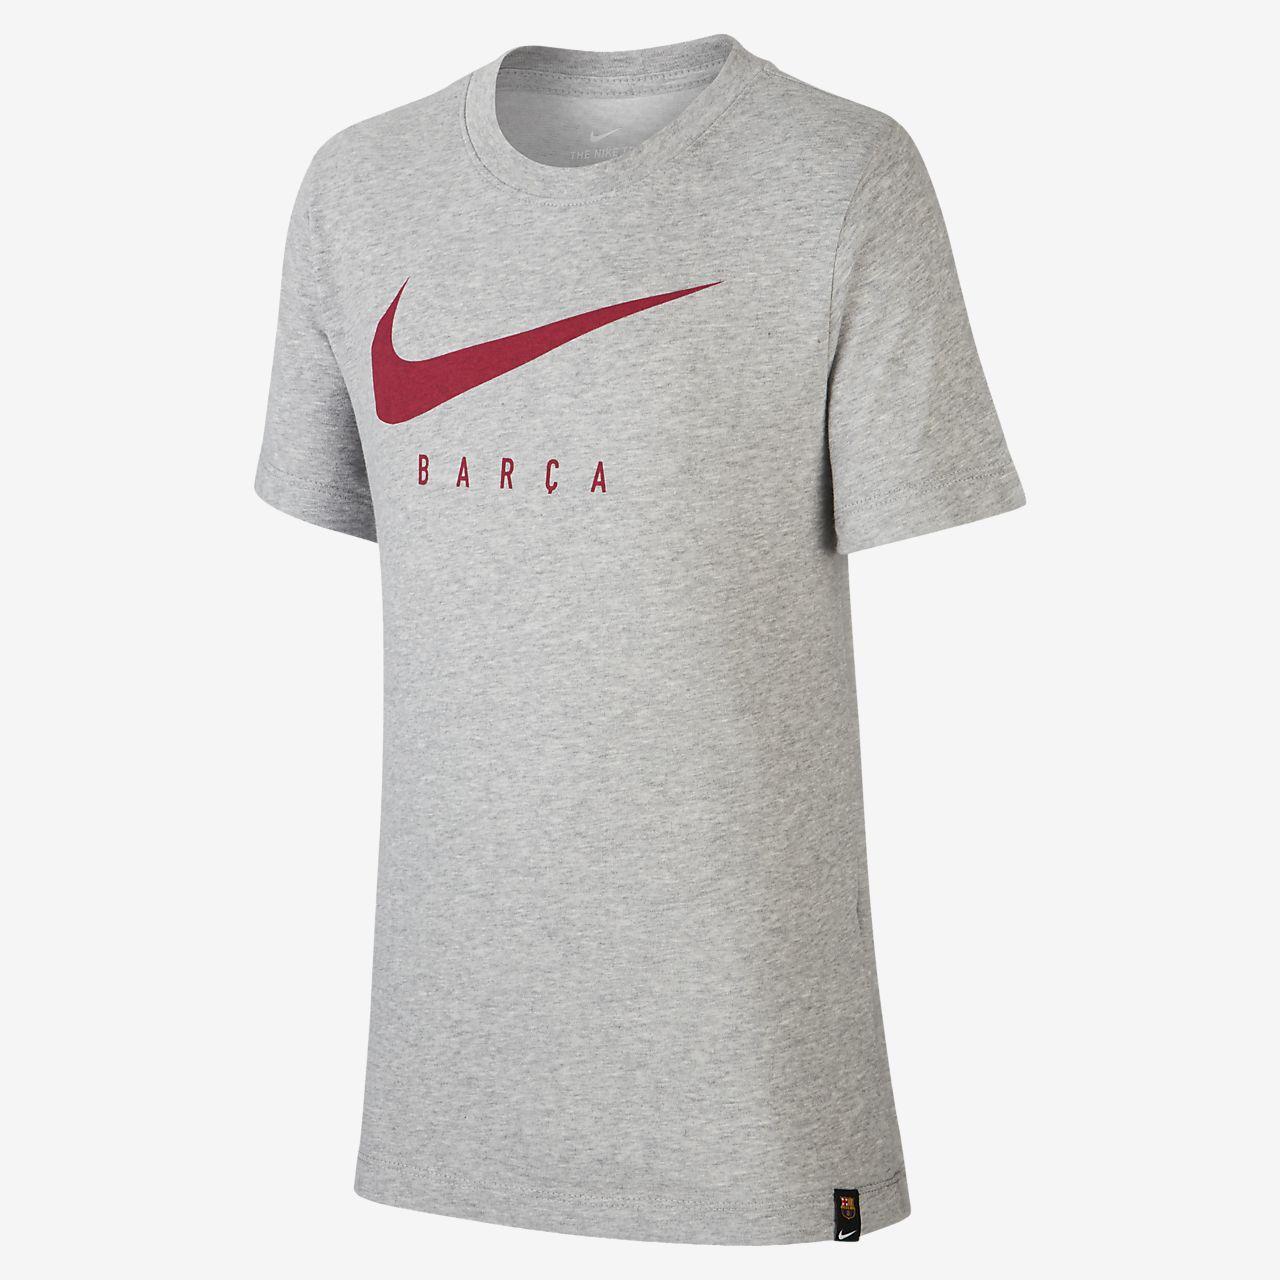 Nike Dri-FIT FC Barcelona futballpóló nagyobb gyerekeknek